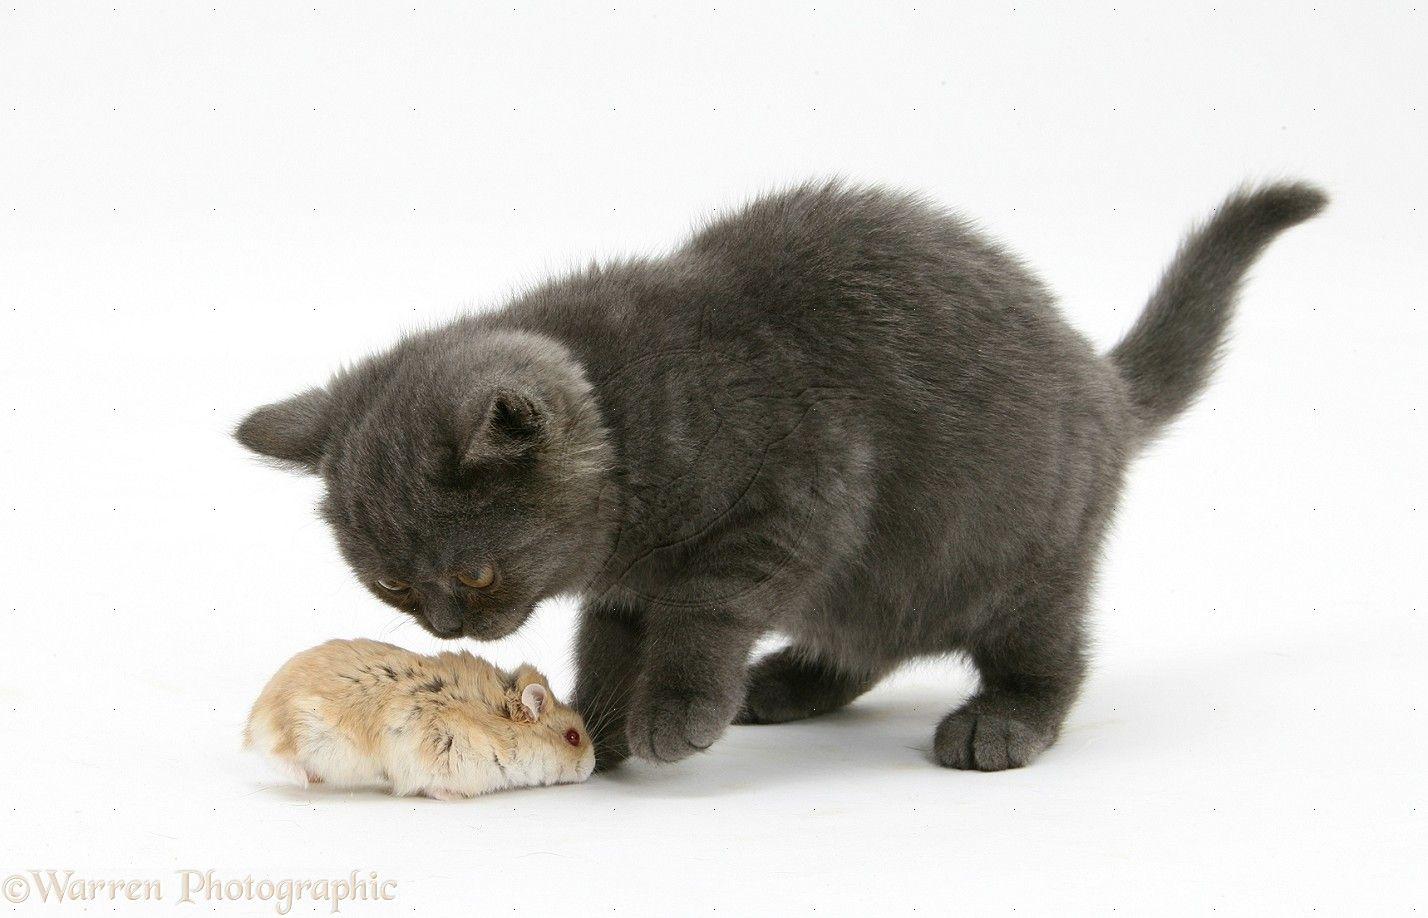 Siberian Dwarf Hamster Grey Kitten Siberian Hamster Kitten